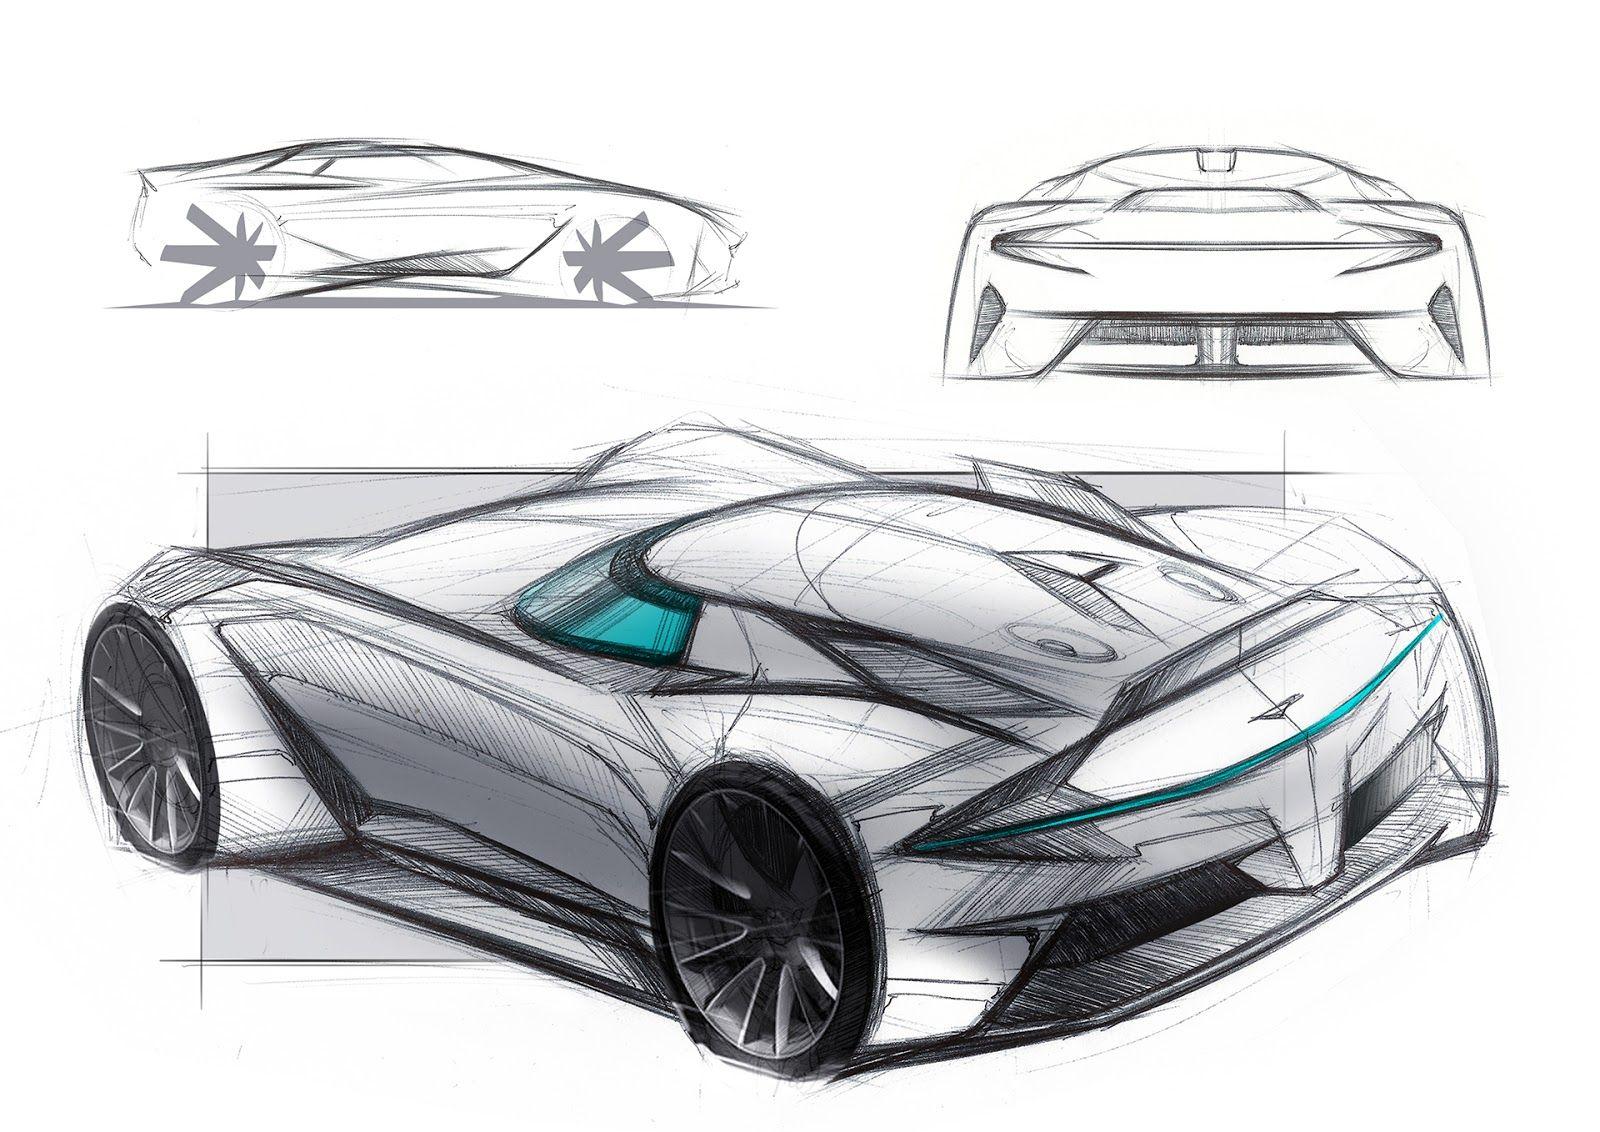 Aston Martin Vision 8 Is A Futuristic V8 Vantage Car Sketches